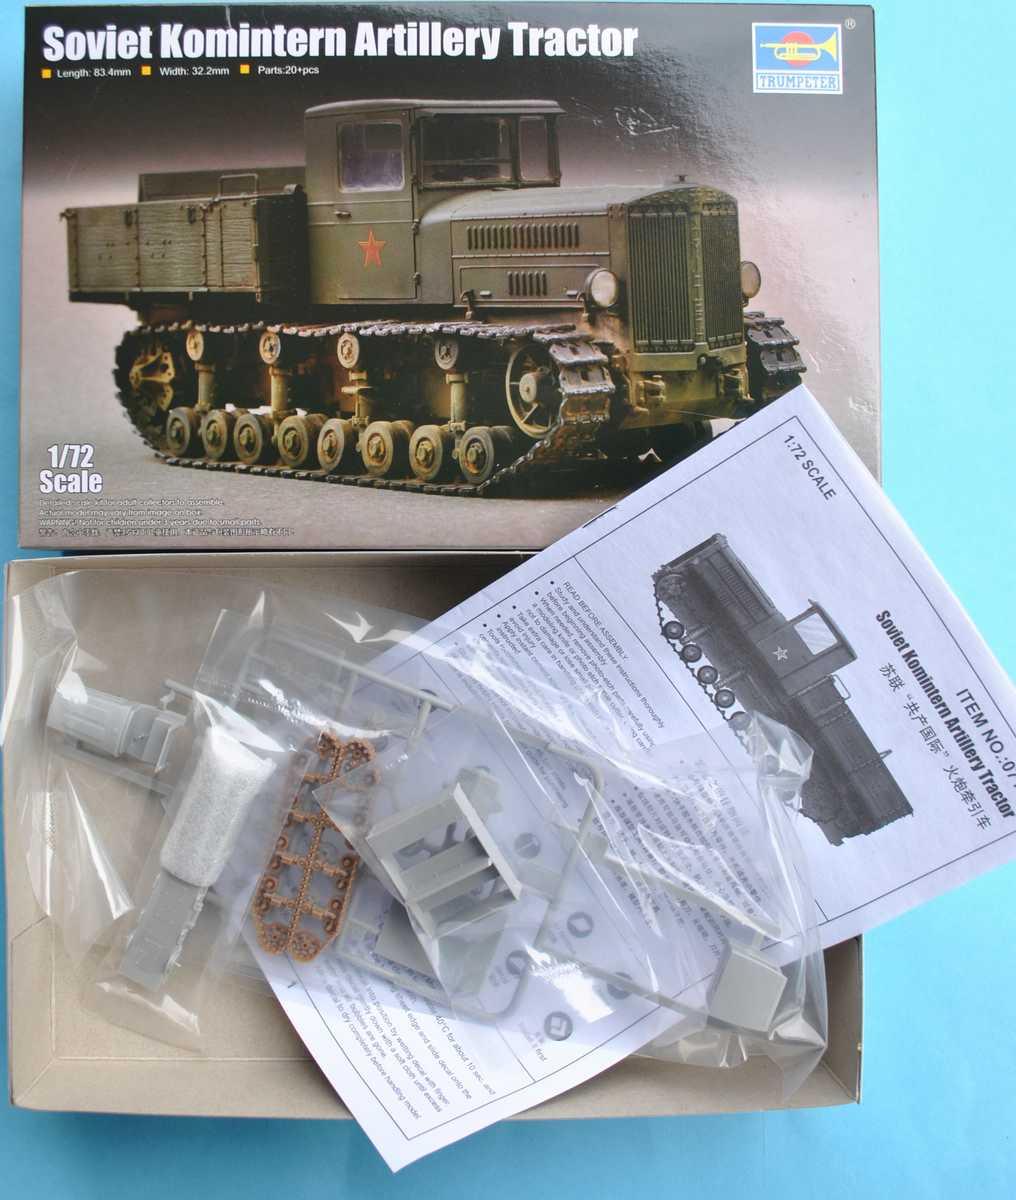 Trumpeter-7120-Komintern-Artillery-tractor-9 Artillerietraktor Komintern im Maßstab 1:72 von Trumpeter (# 07120 )